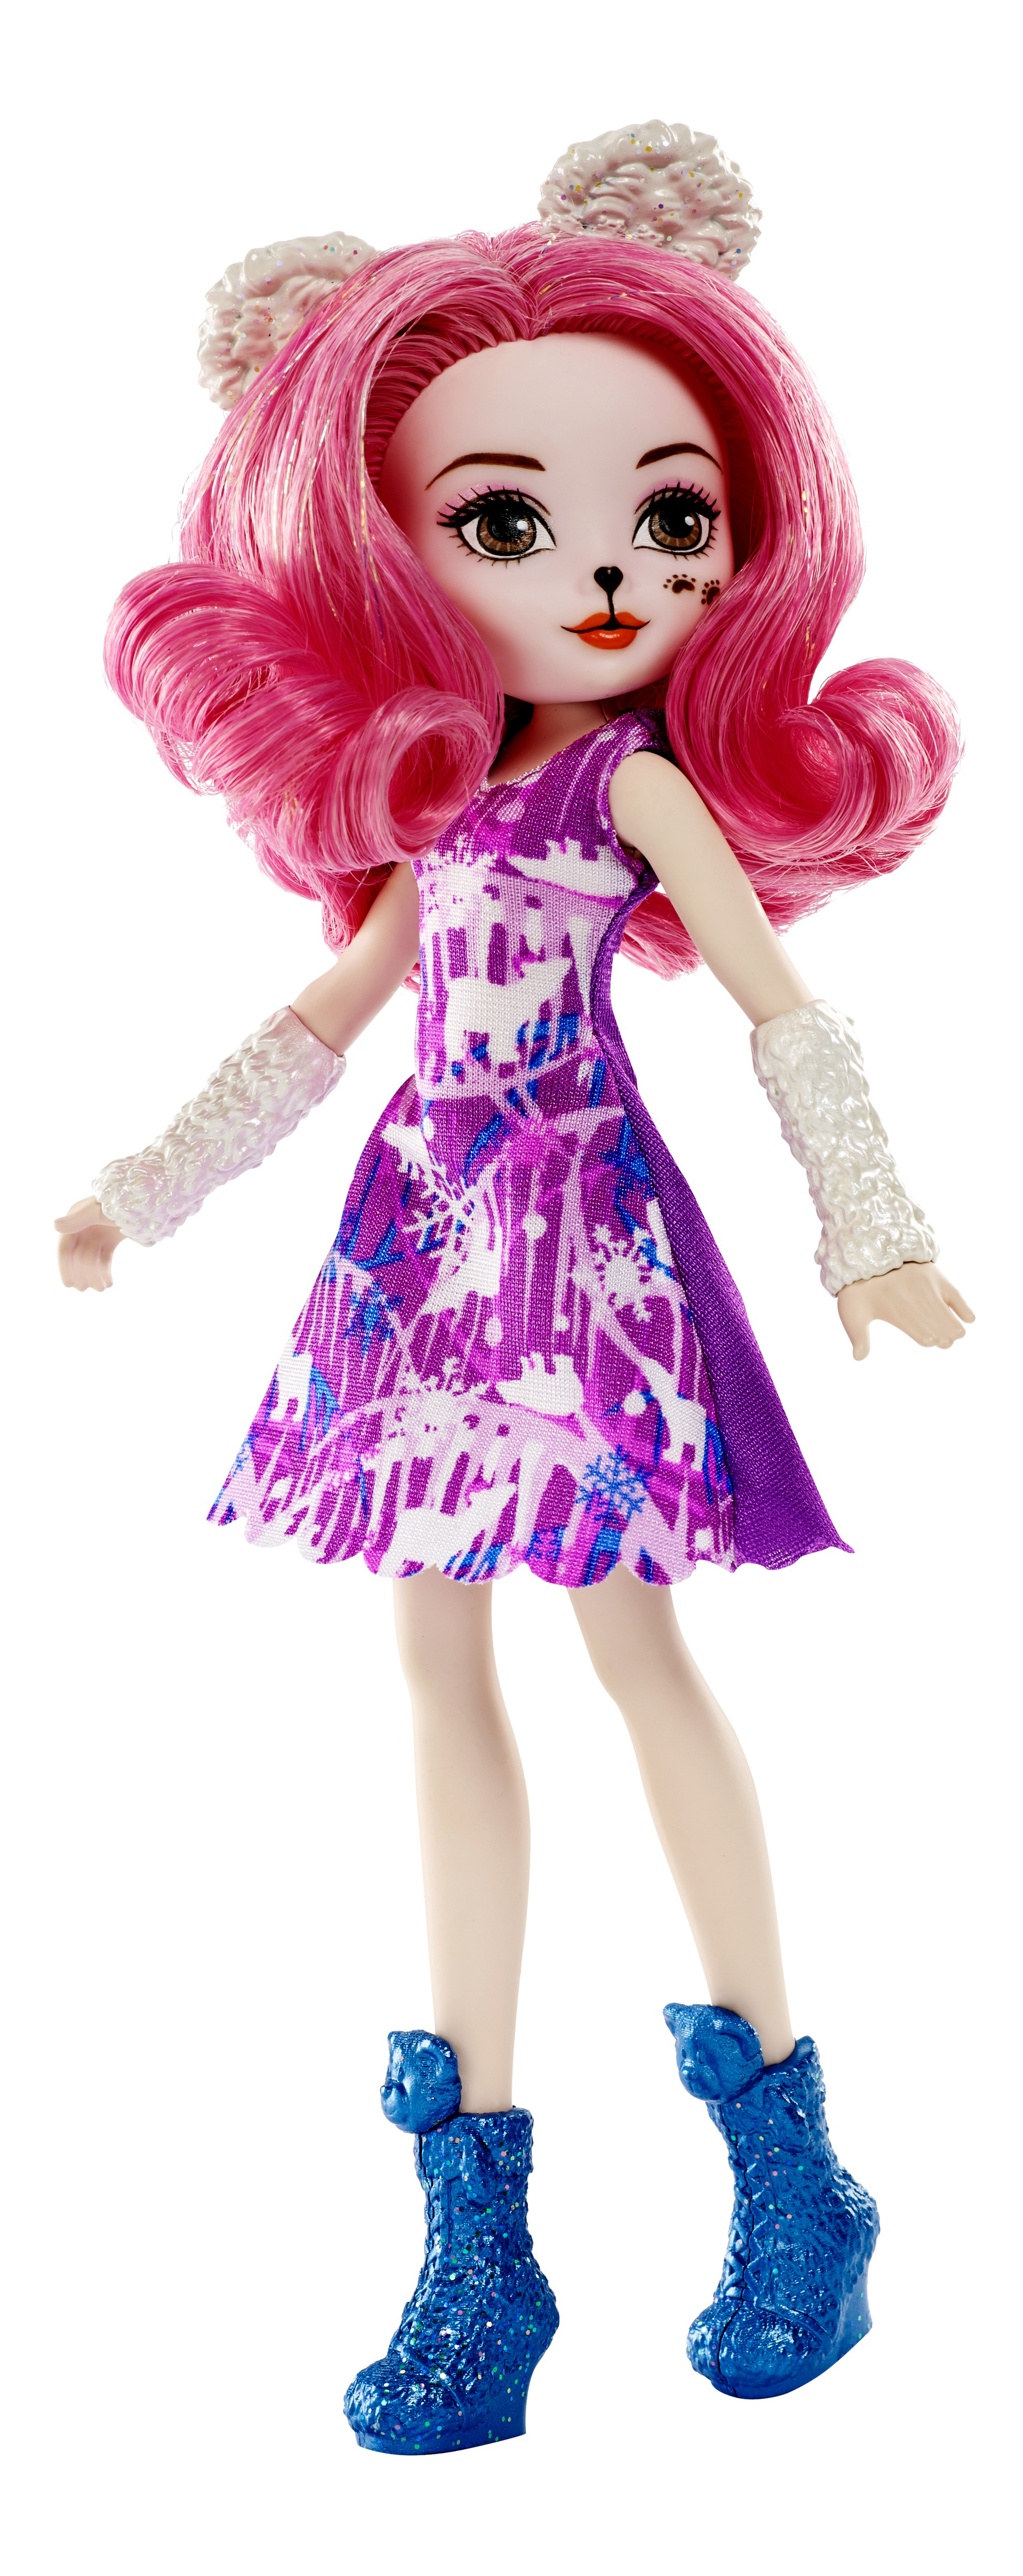 Купить Кукла Ever After High Заколдованная зима DNR63 DNR65, Куклы